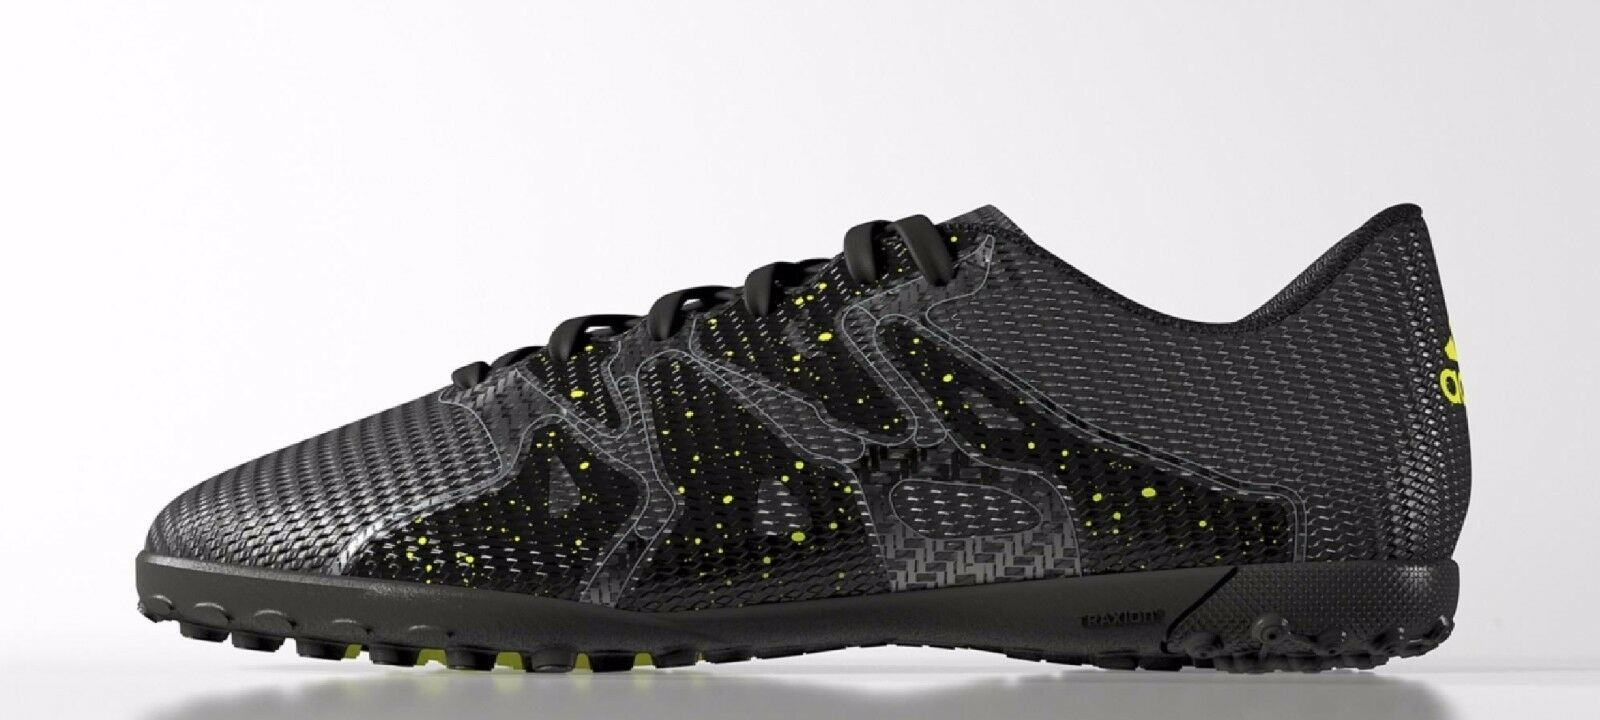 adidas x15.4 kids turf trainer